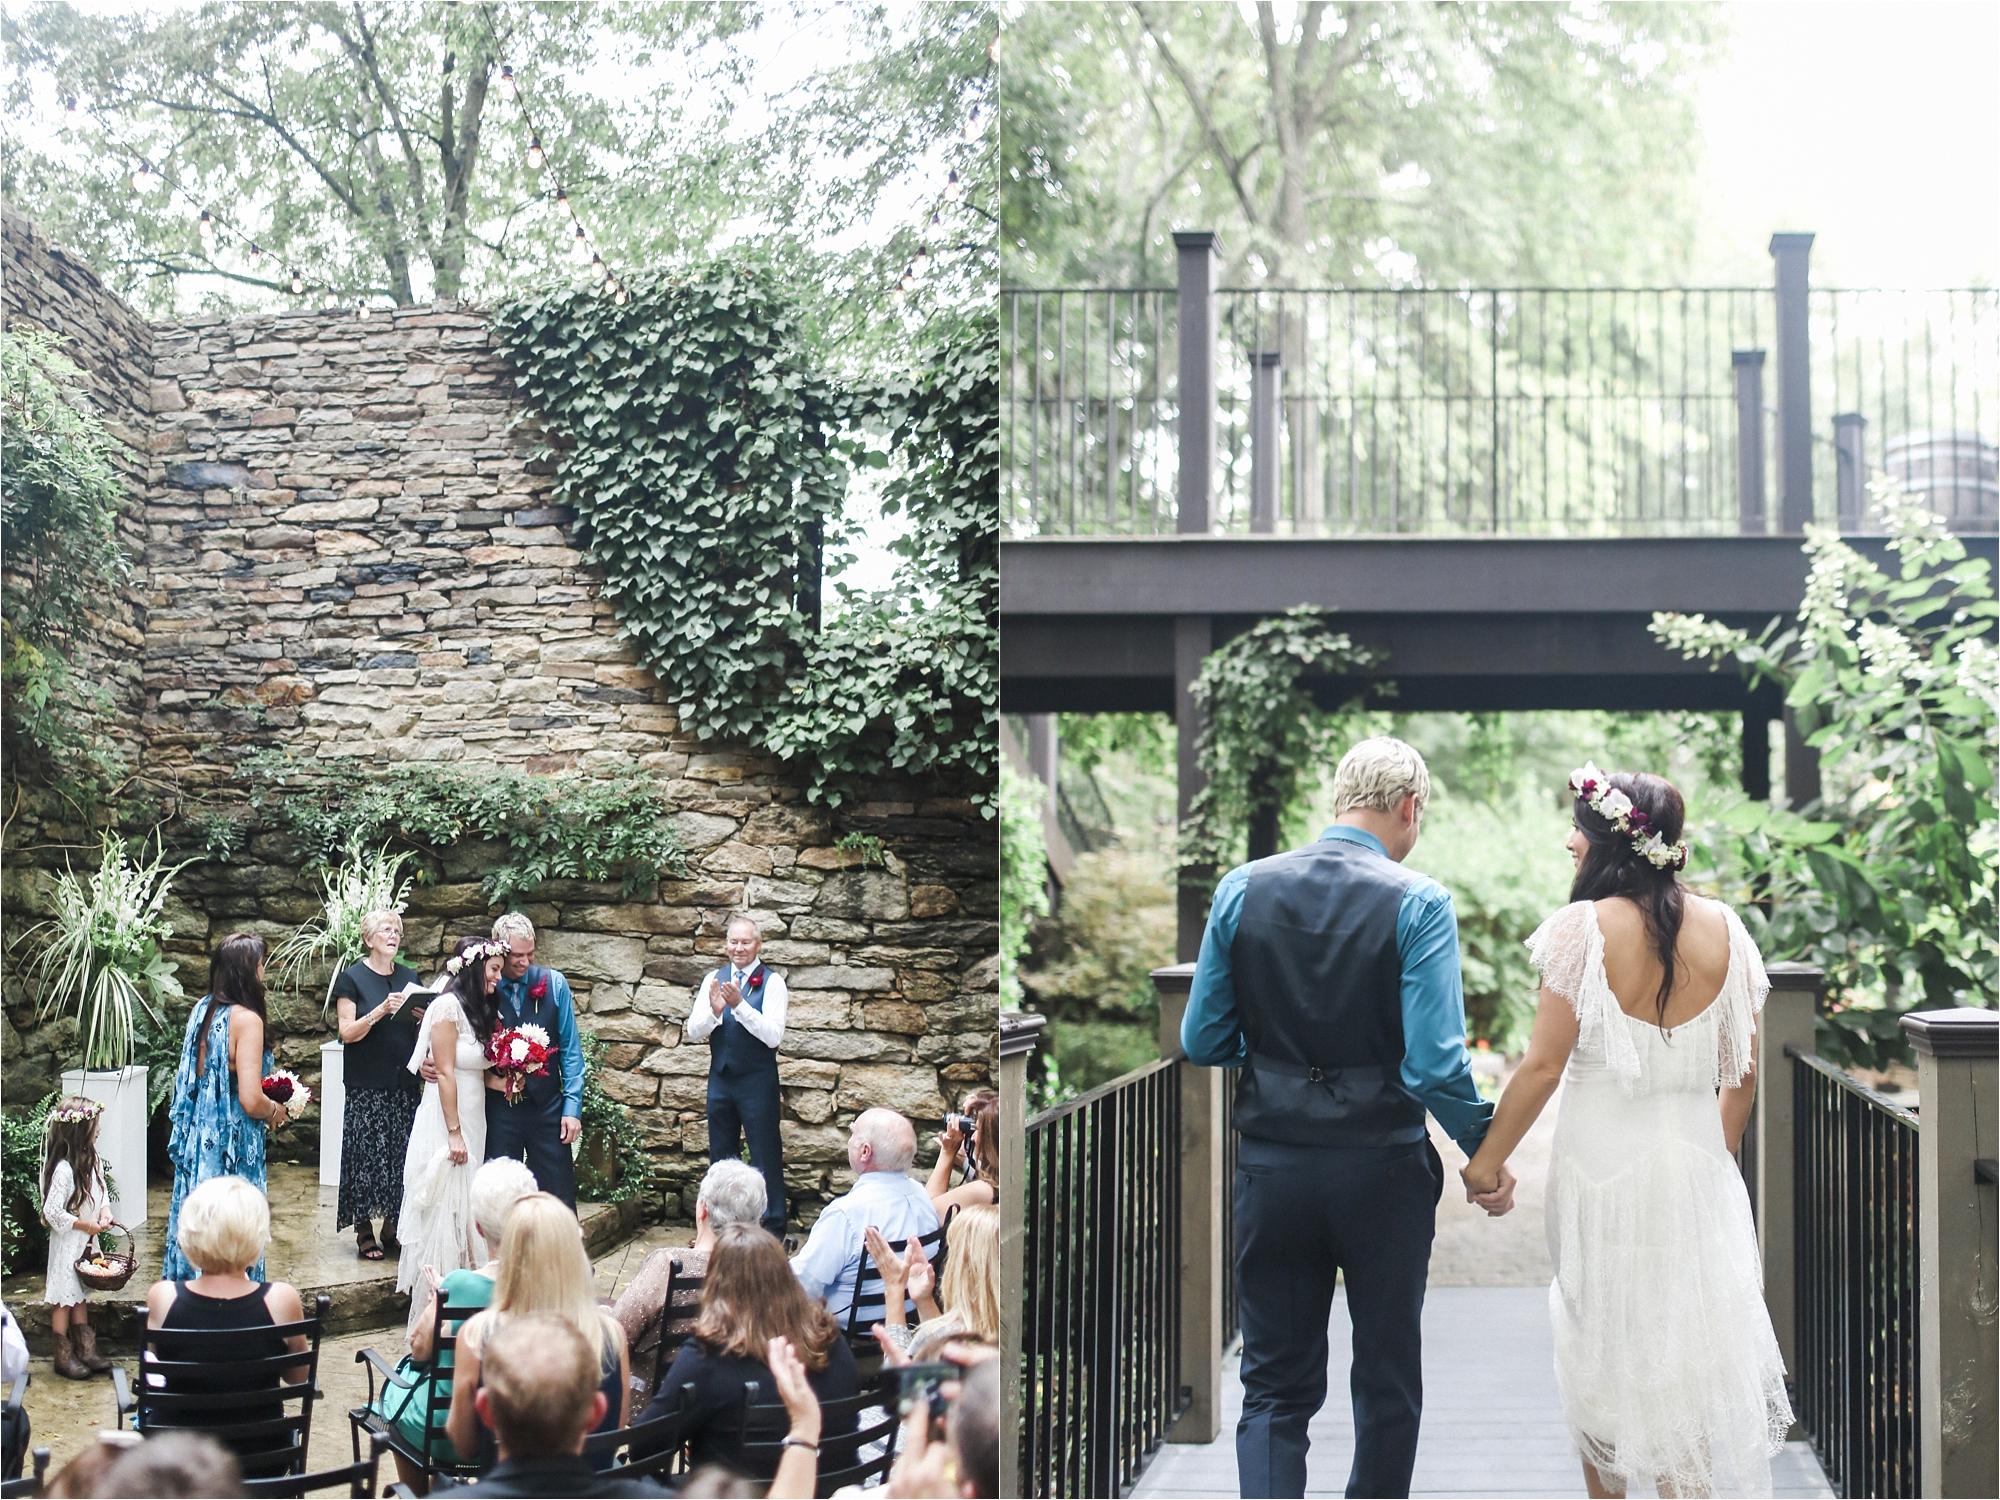 stephanie-yonce-photography-richmond-virginia-bohemian-outdoor-wedding-photo_0018.jpg